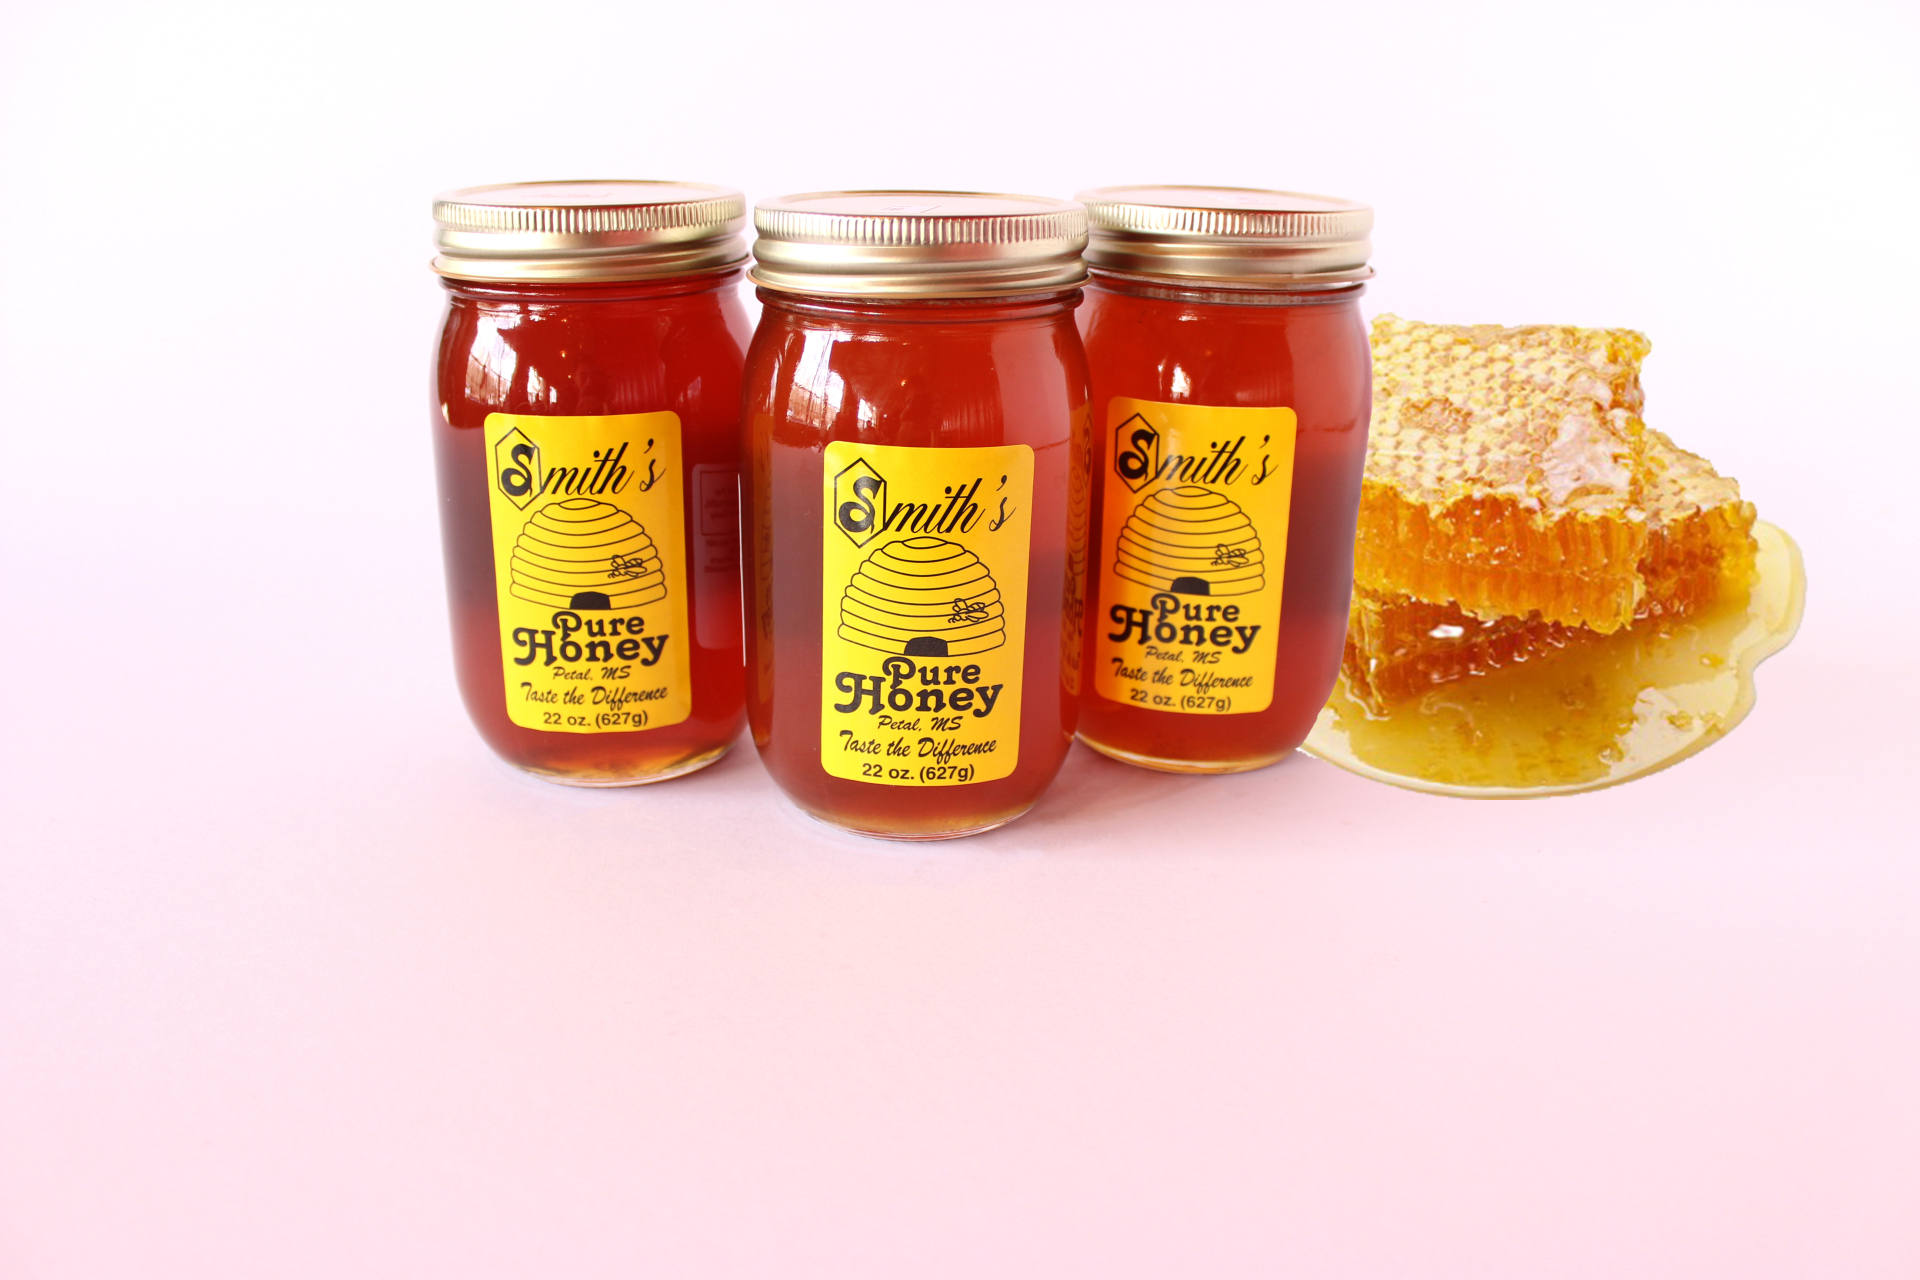 Smith's Pure Honey